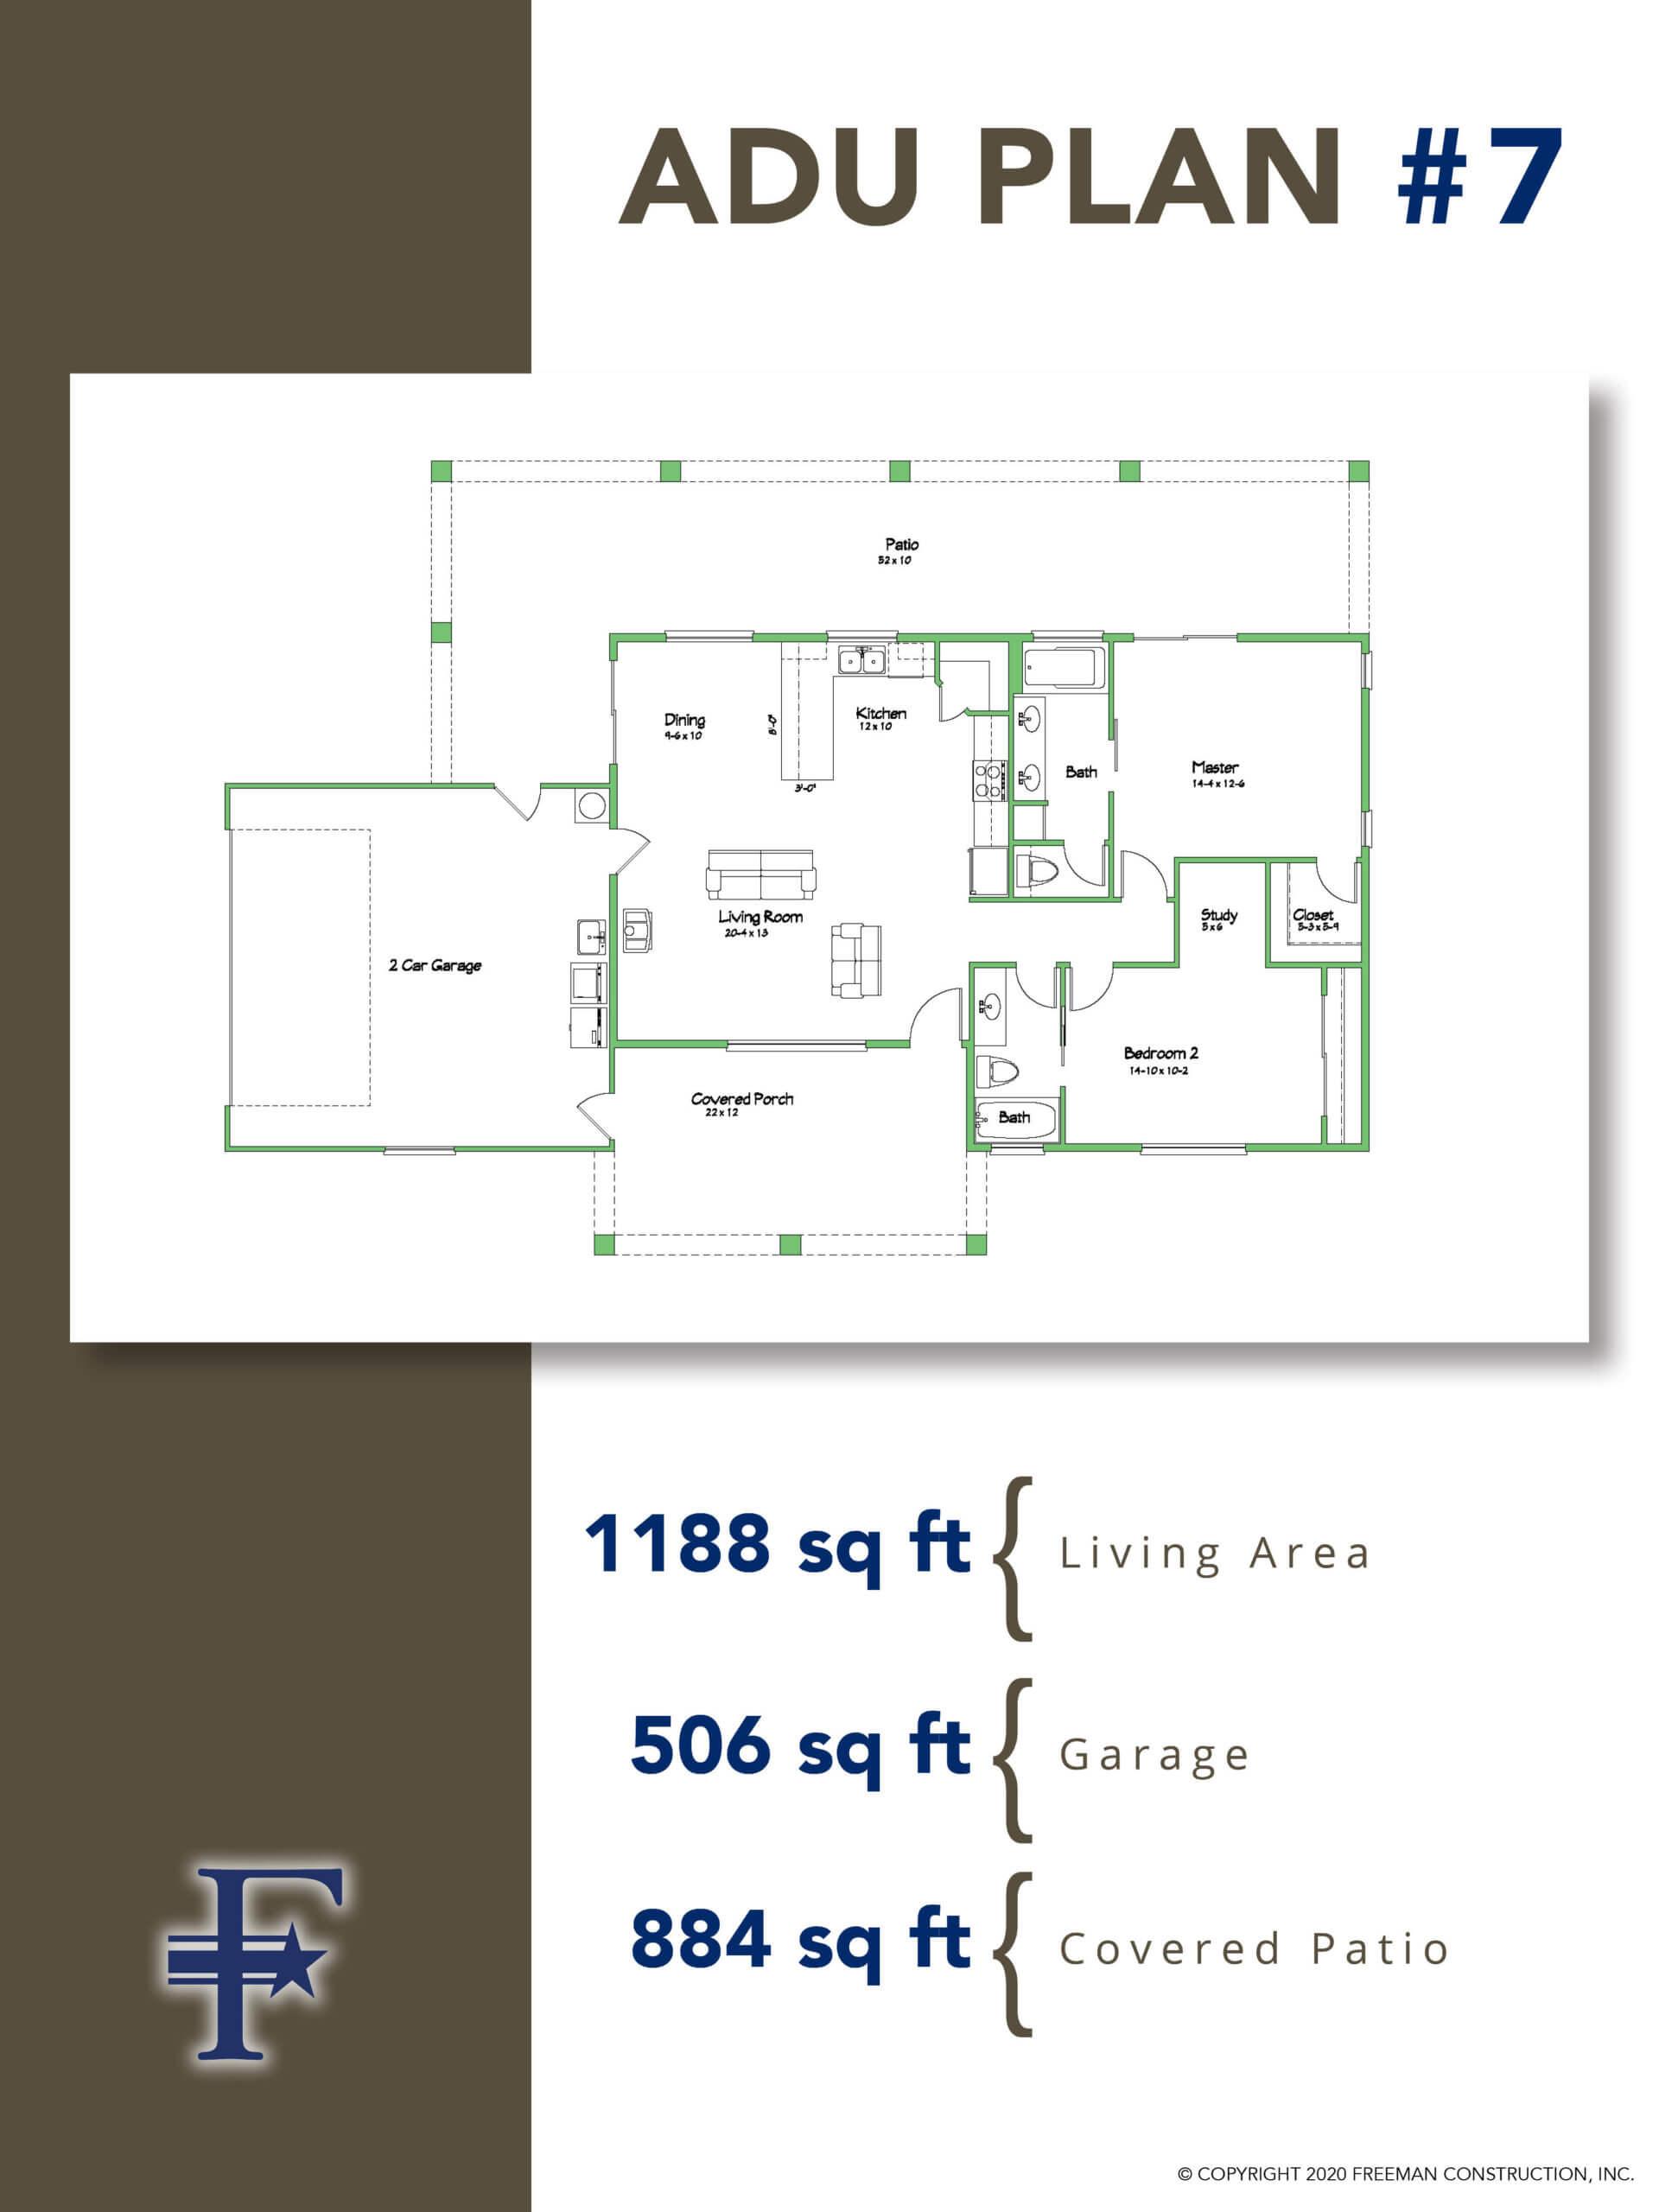 plan#7-adu-floor-plan